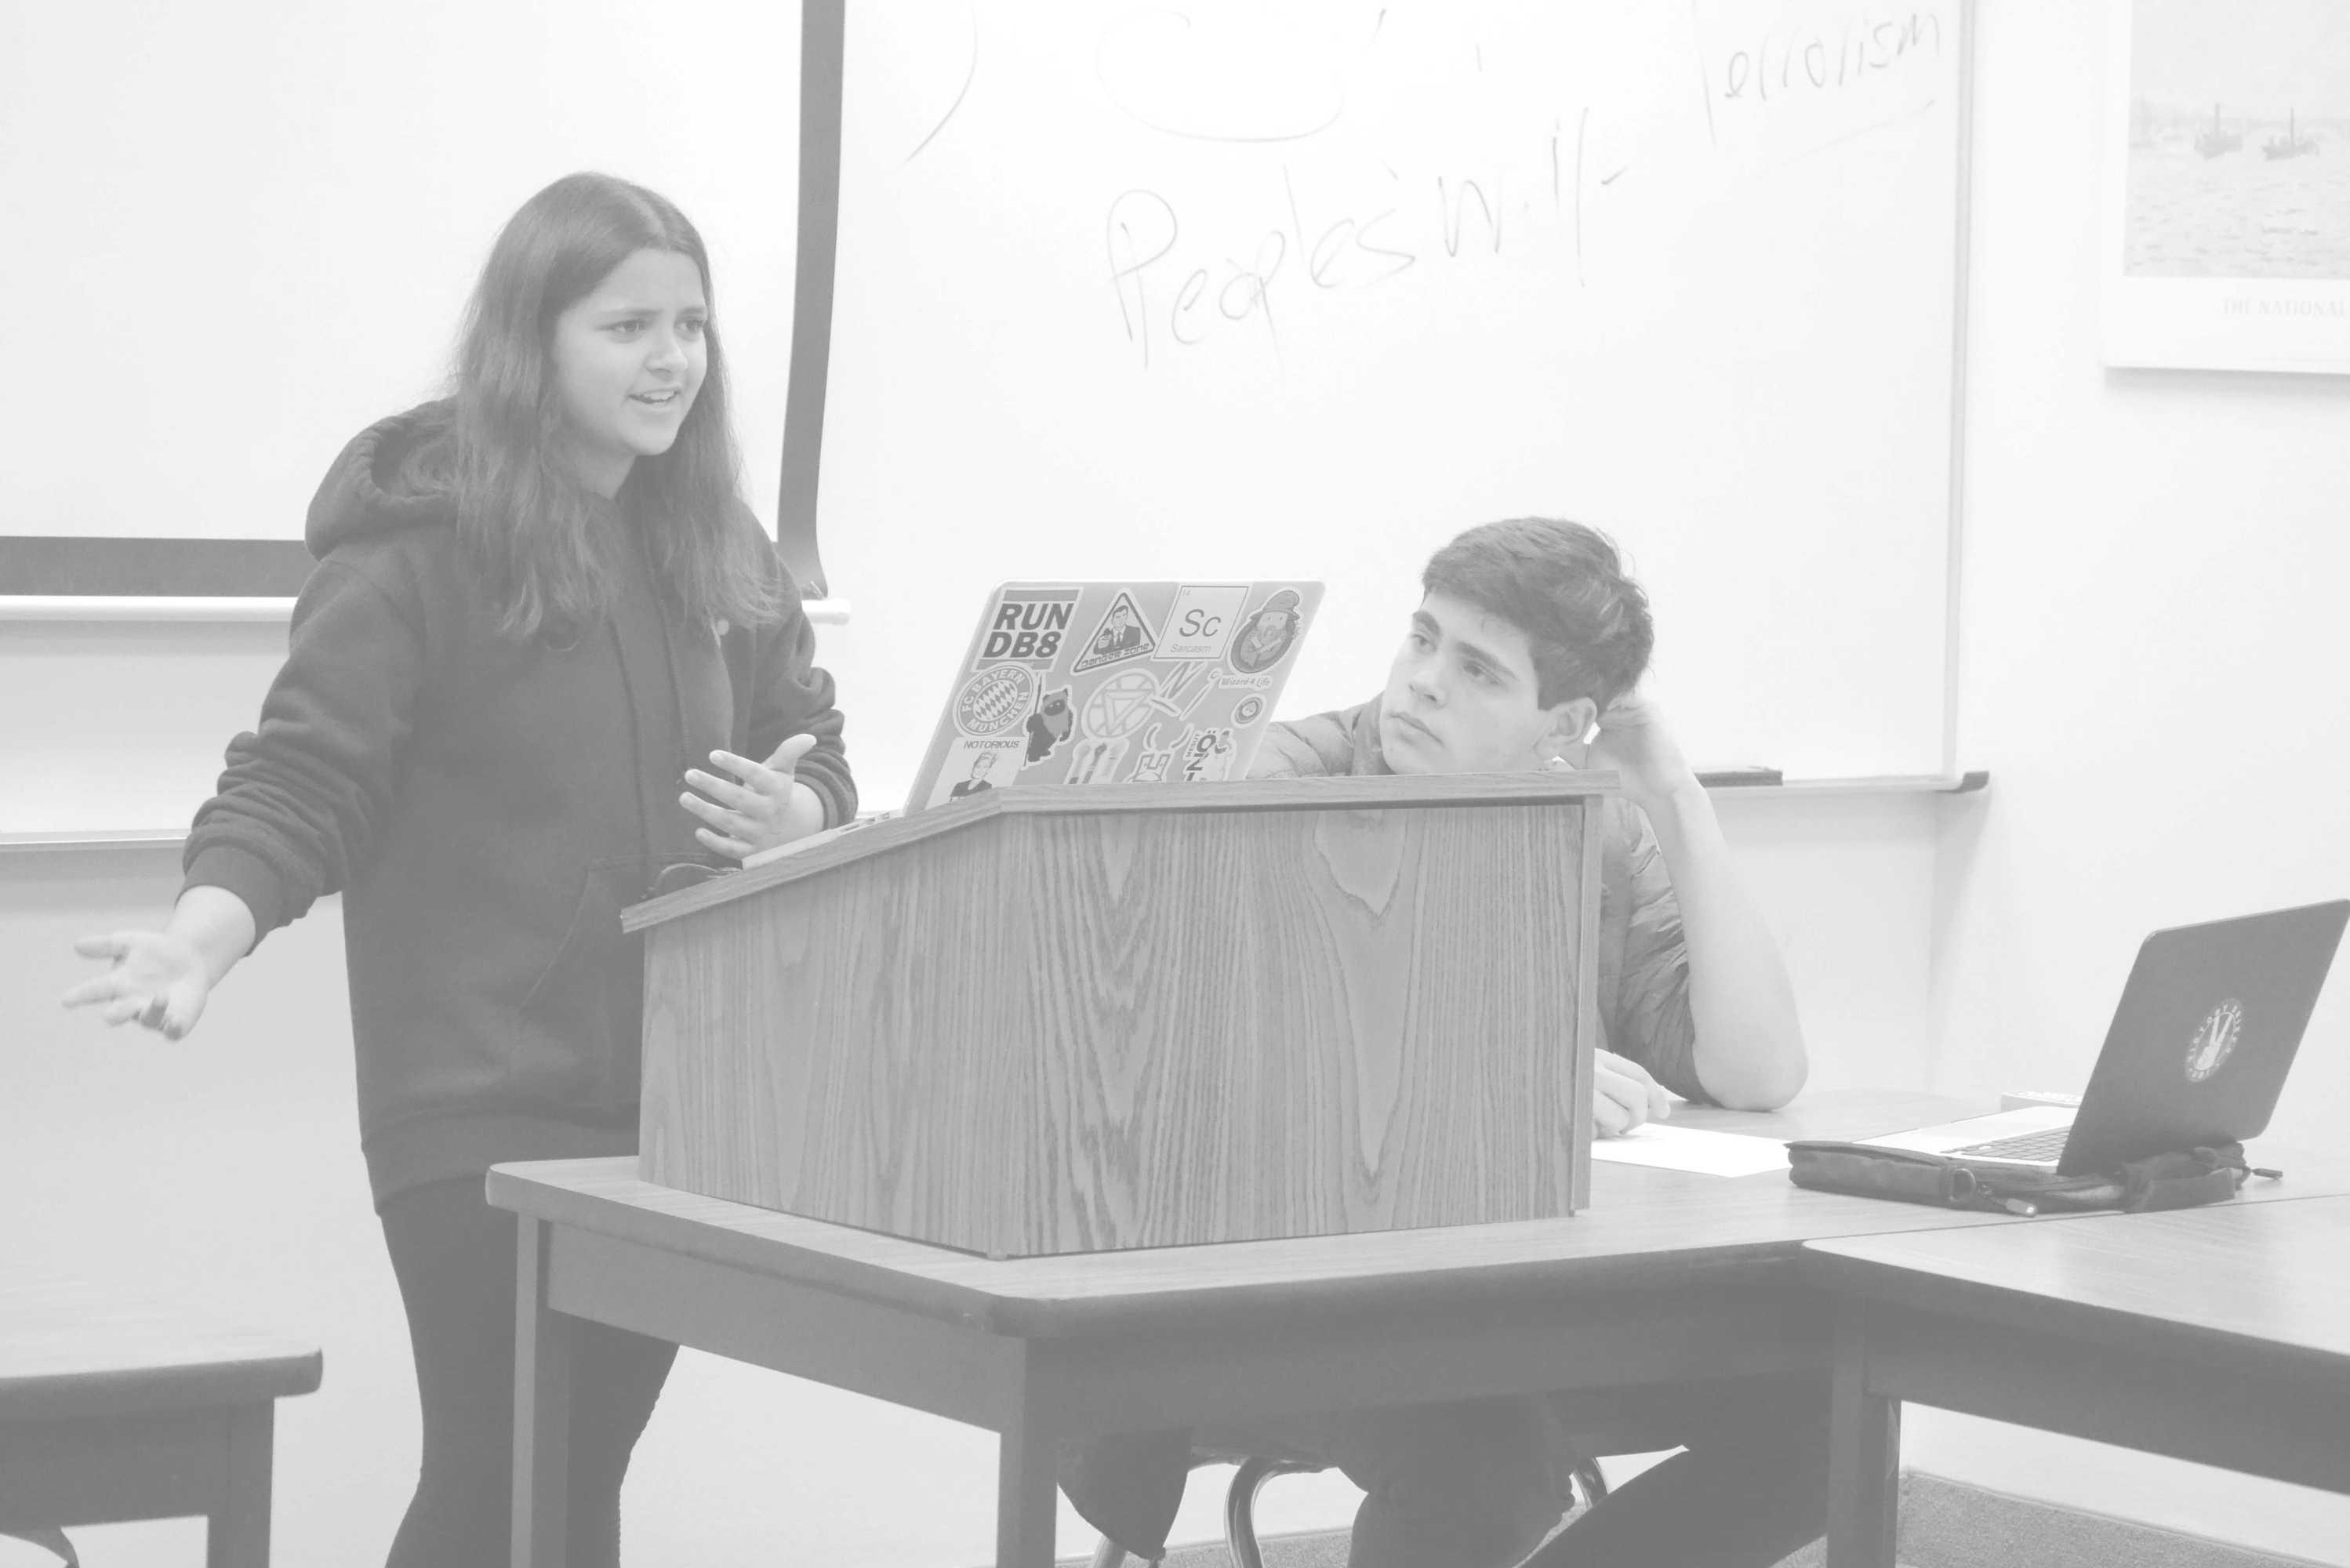 debate GRAYSCALE